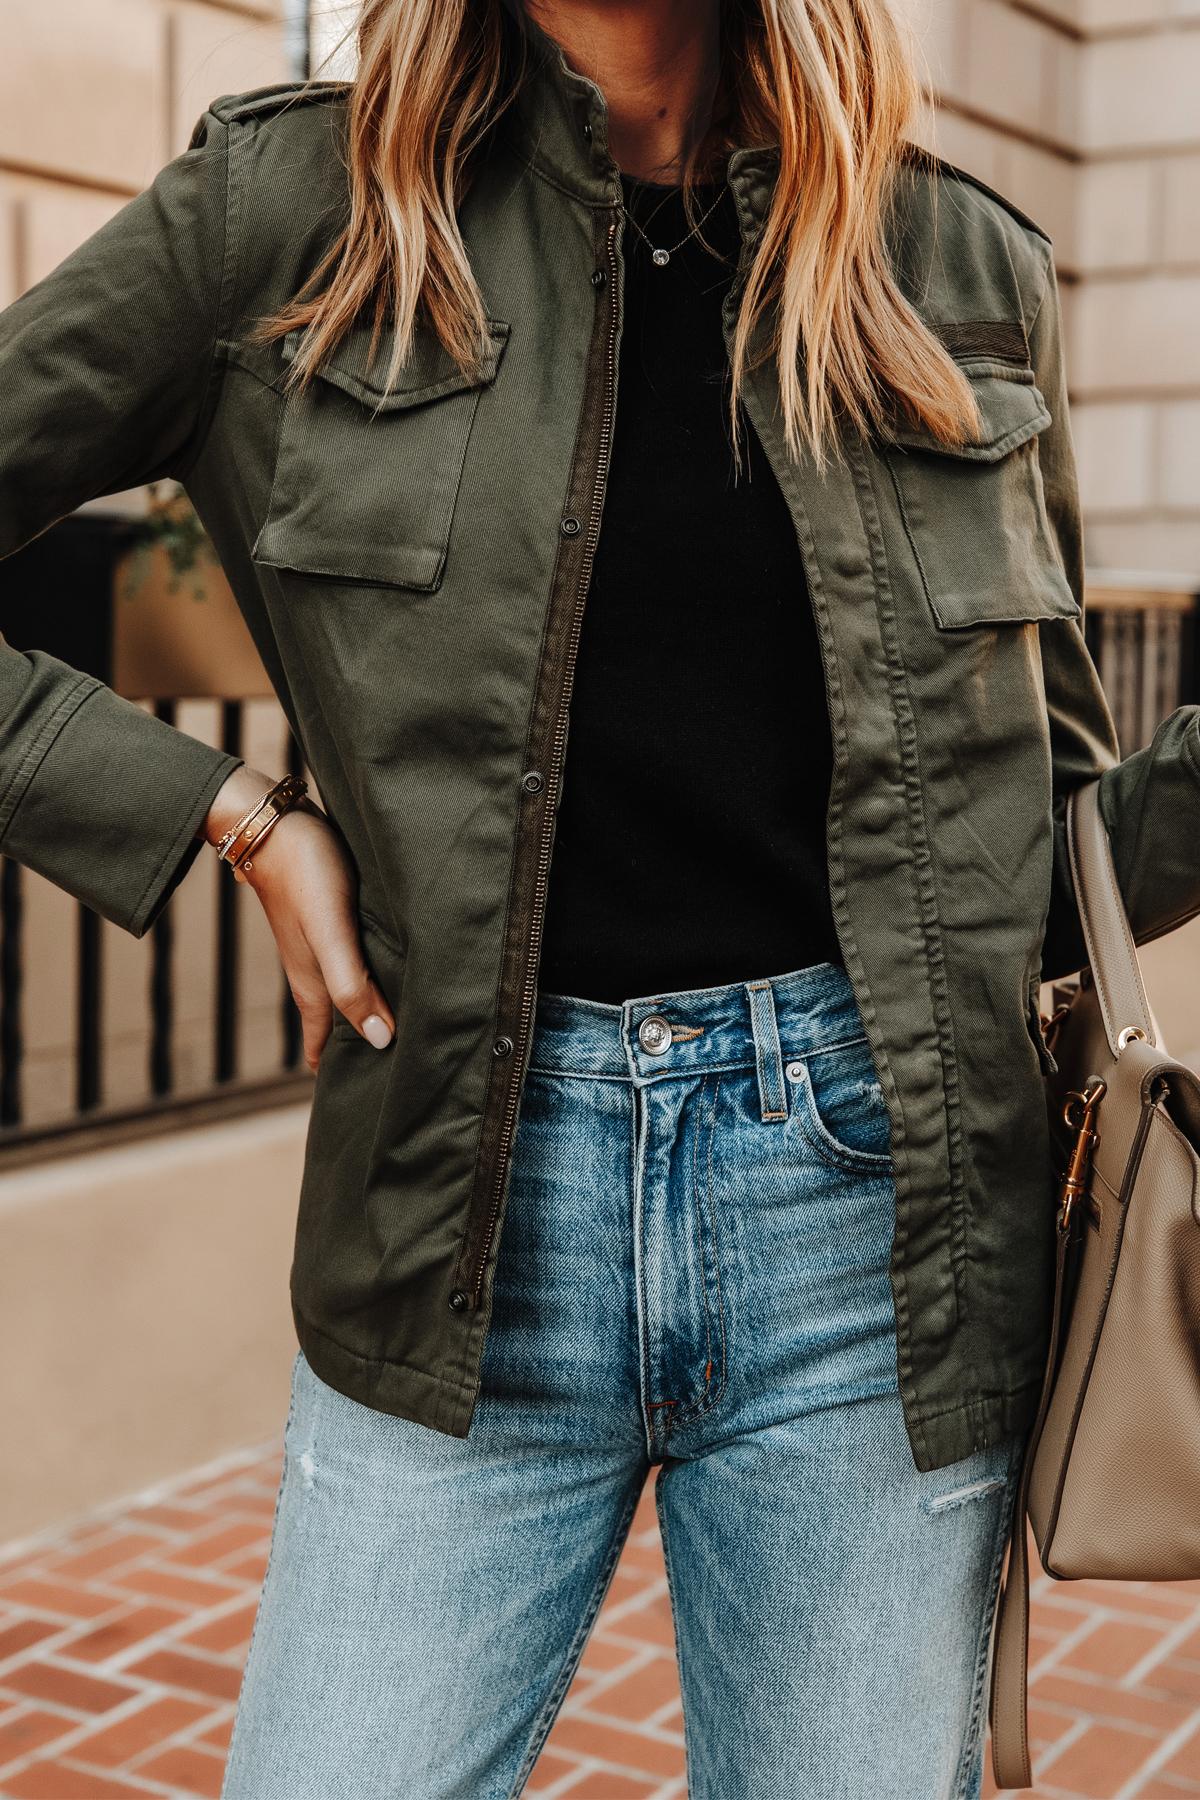 Fashion Jackson Wearing Anine Bing Army Jacket Black Tshirt Blue Jeans Outfit